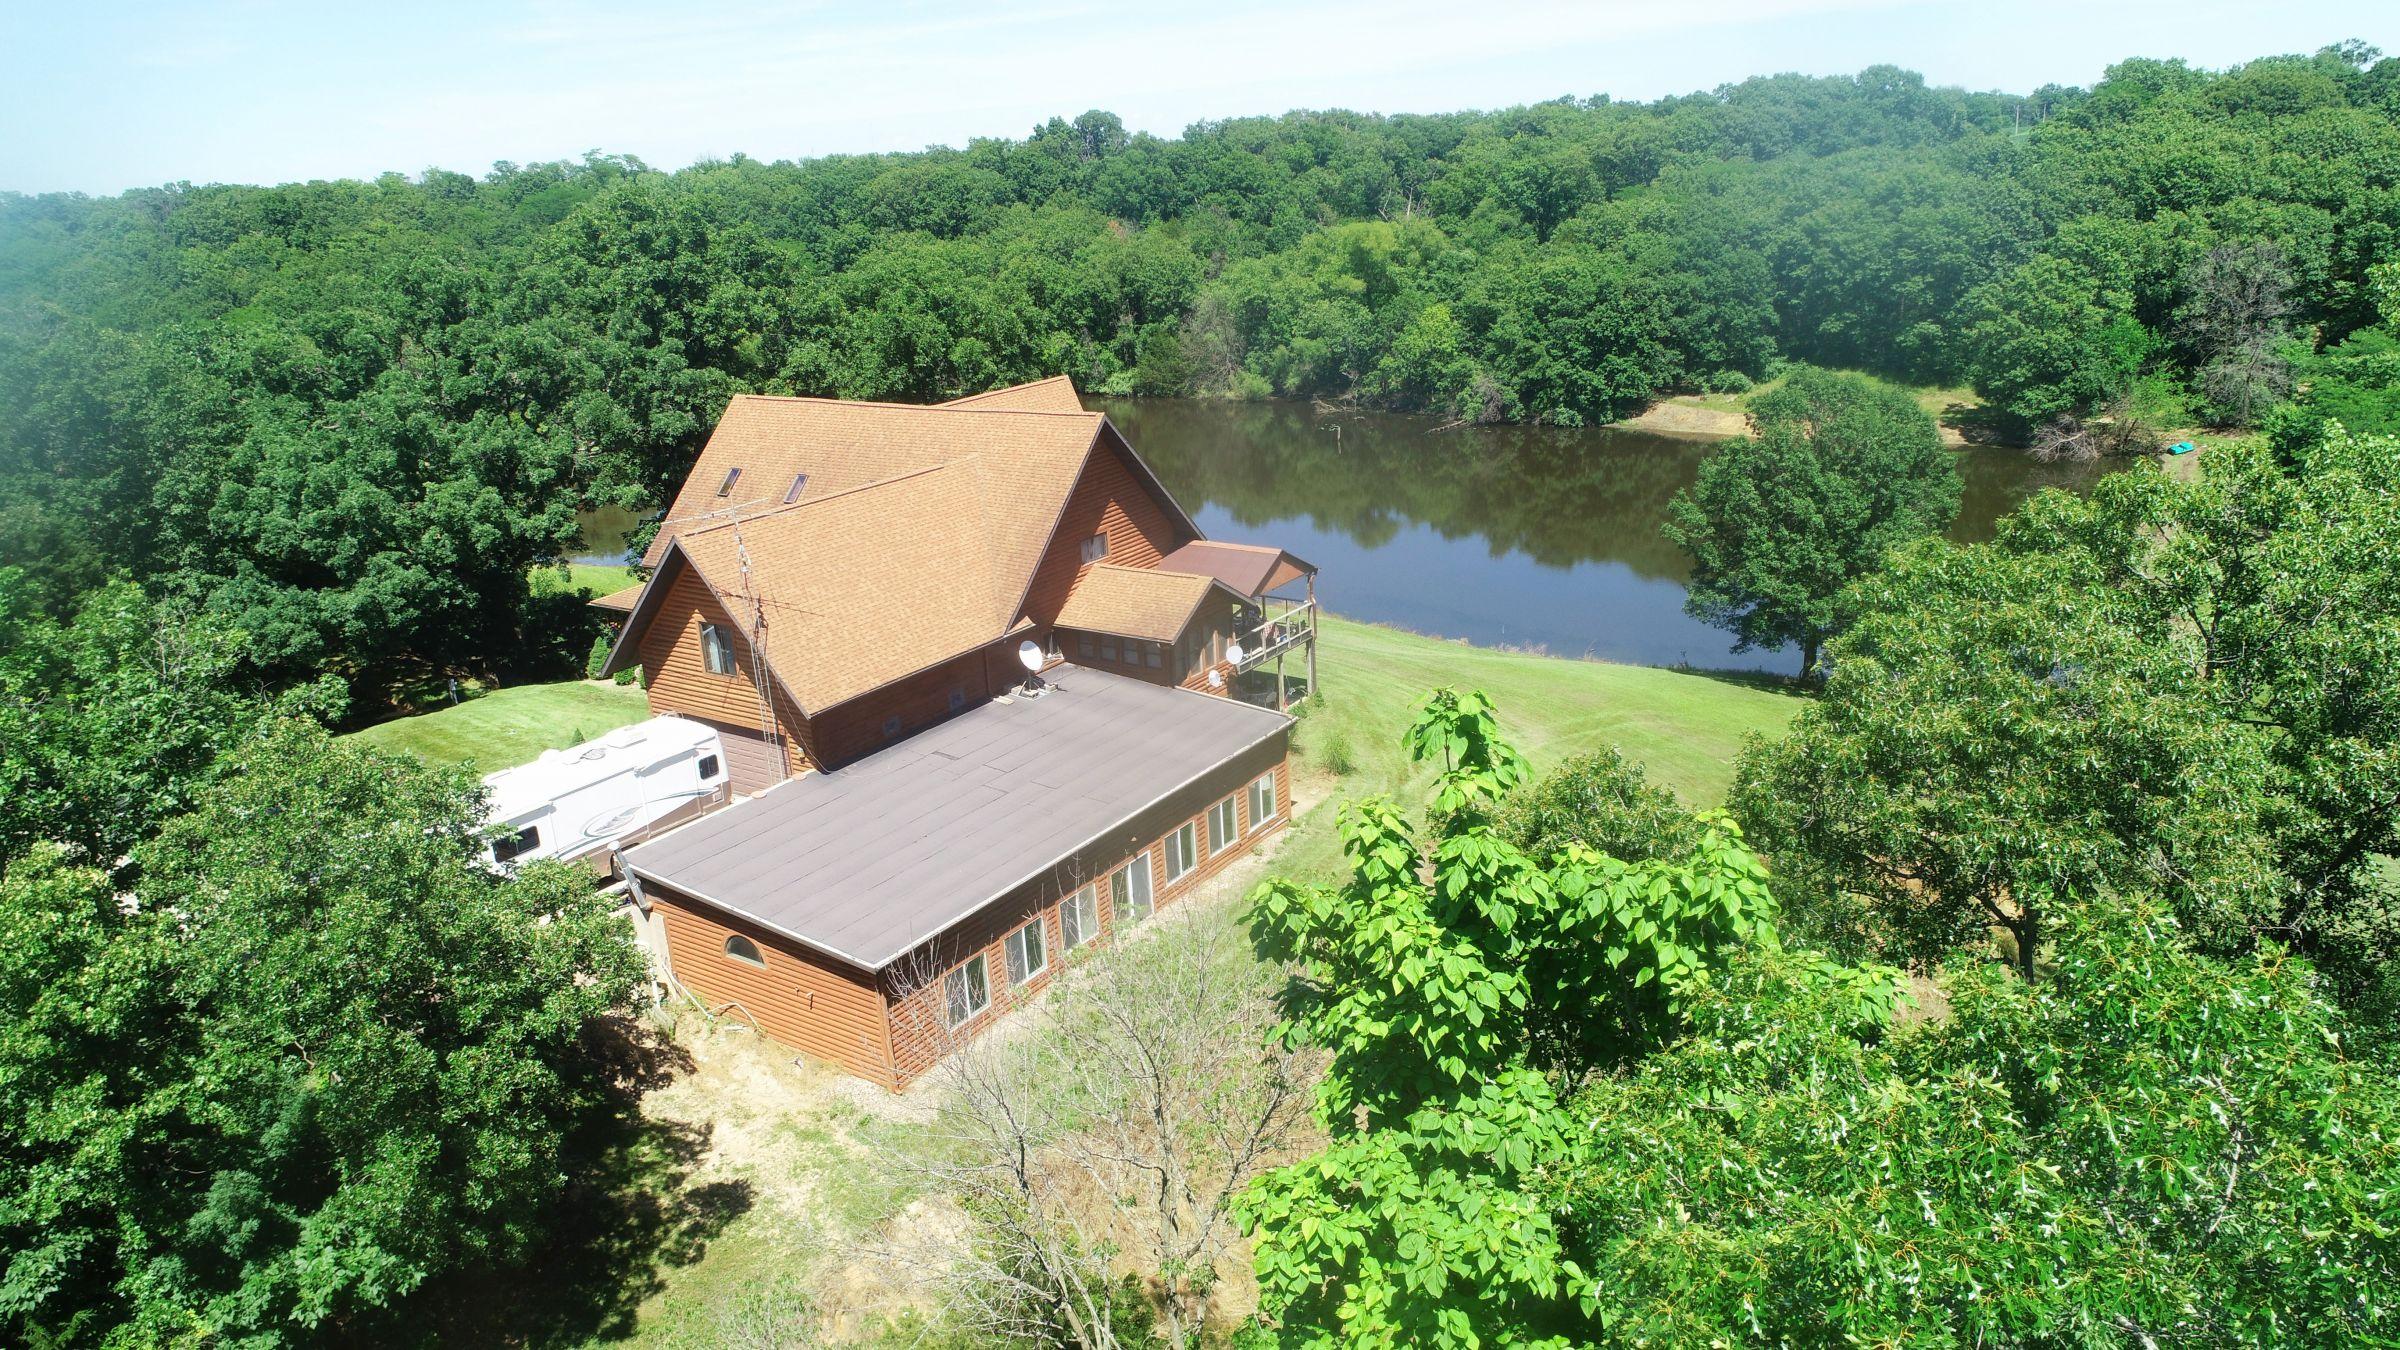 land-lee-county-iowa-328-acres-listing-number-15137-6-2020-08-27-174859.jpg